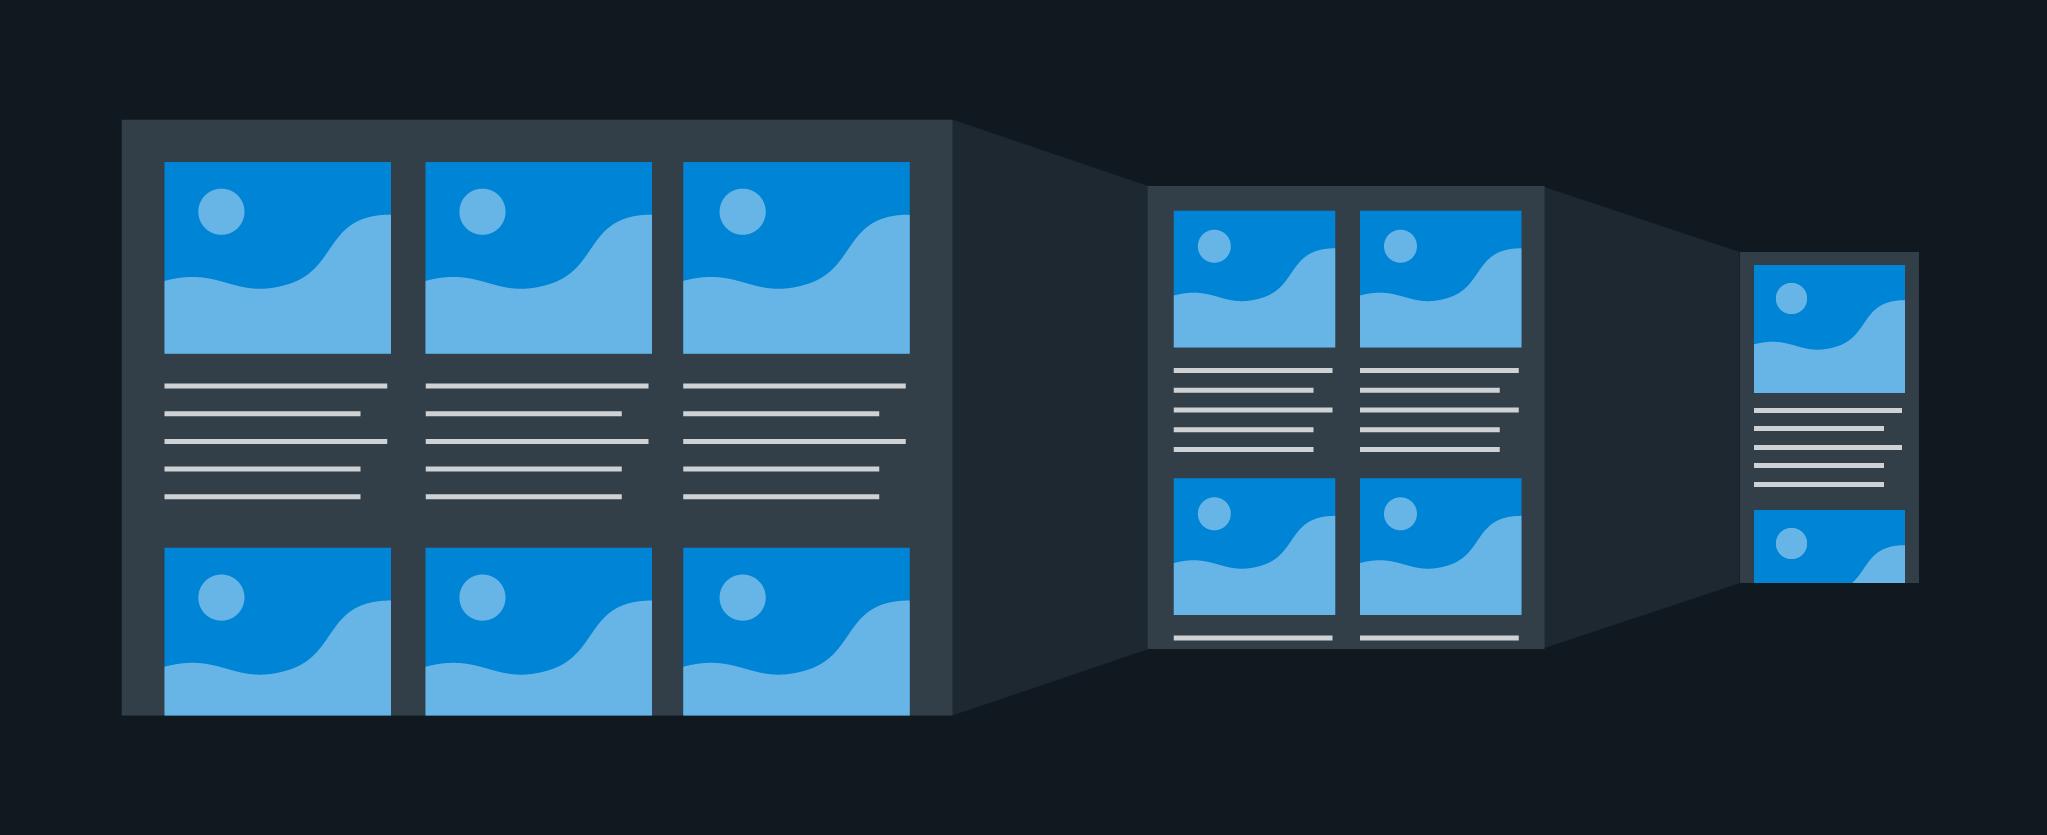 Illustration of flexible layouts